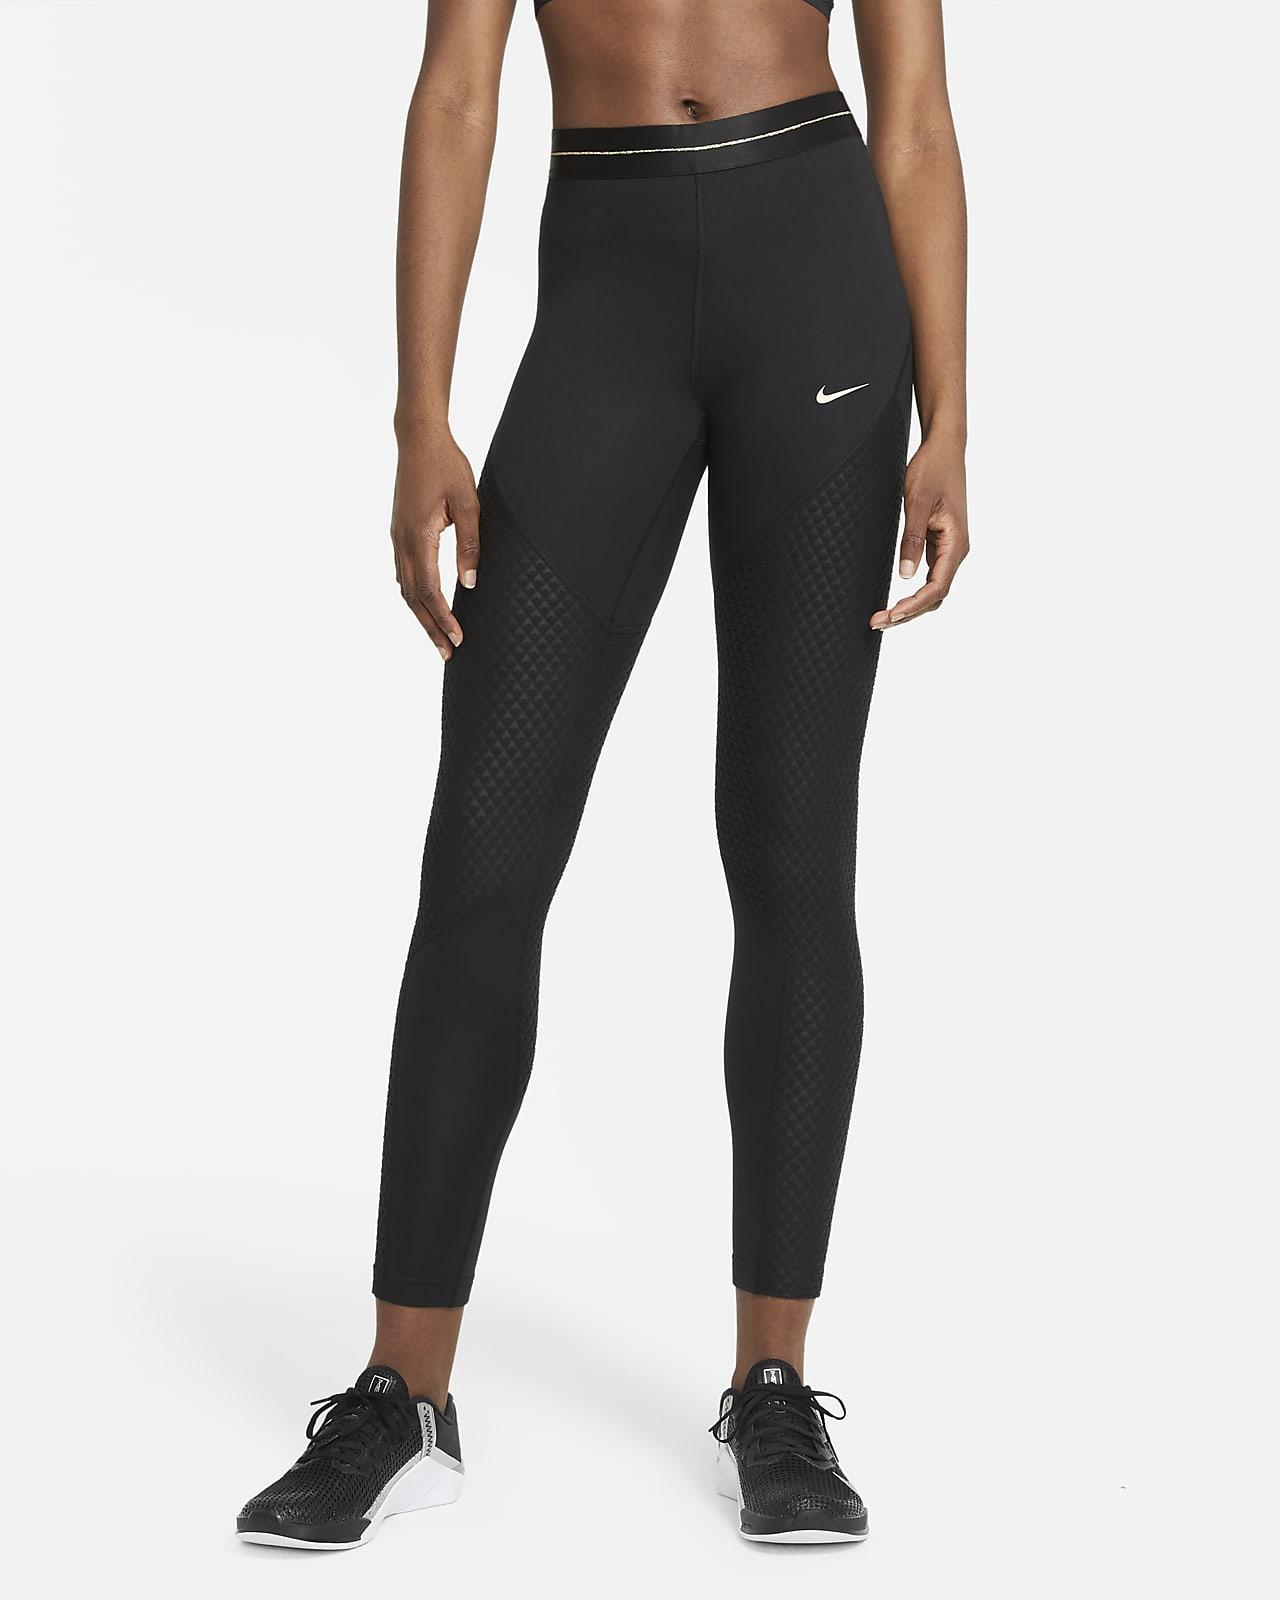 Nike Pro Icon Clash Women's Tights